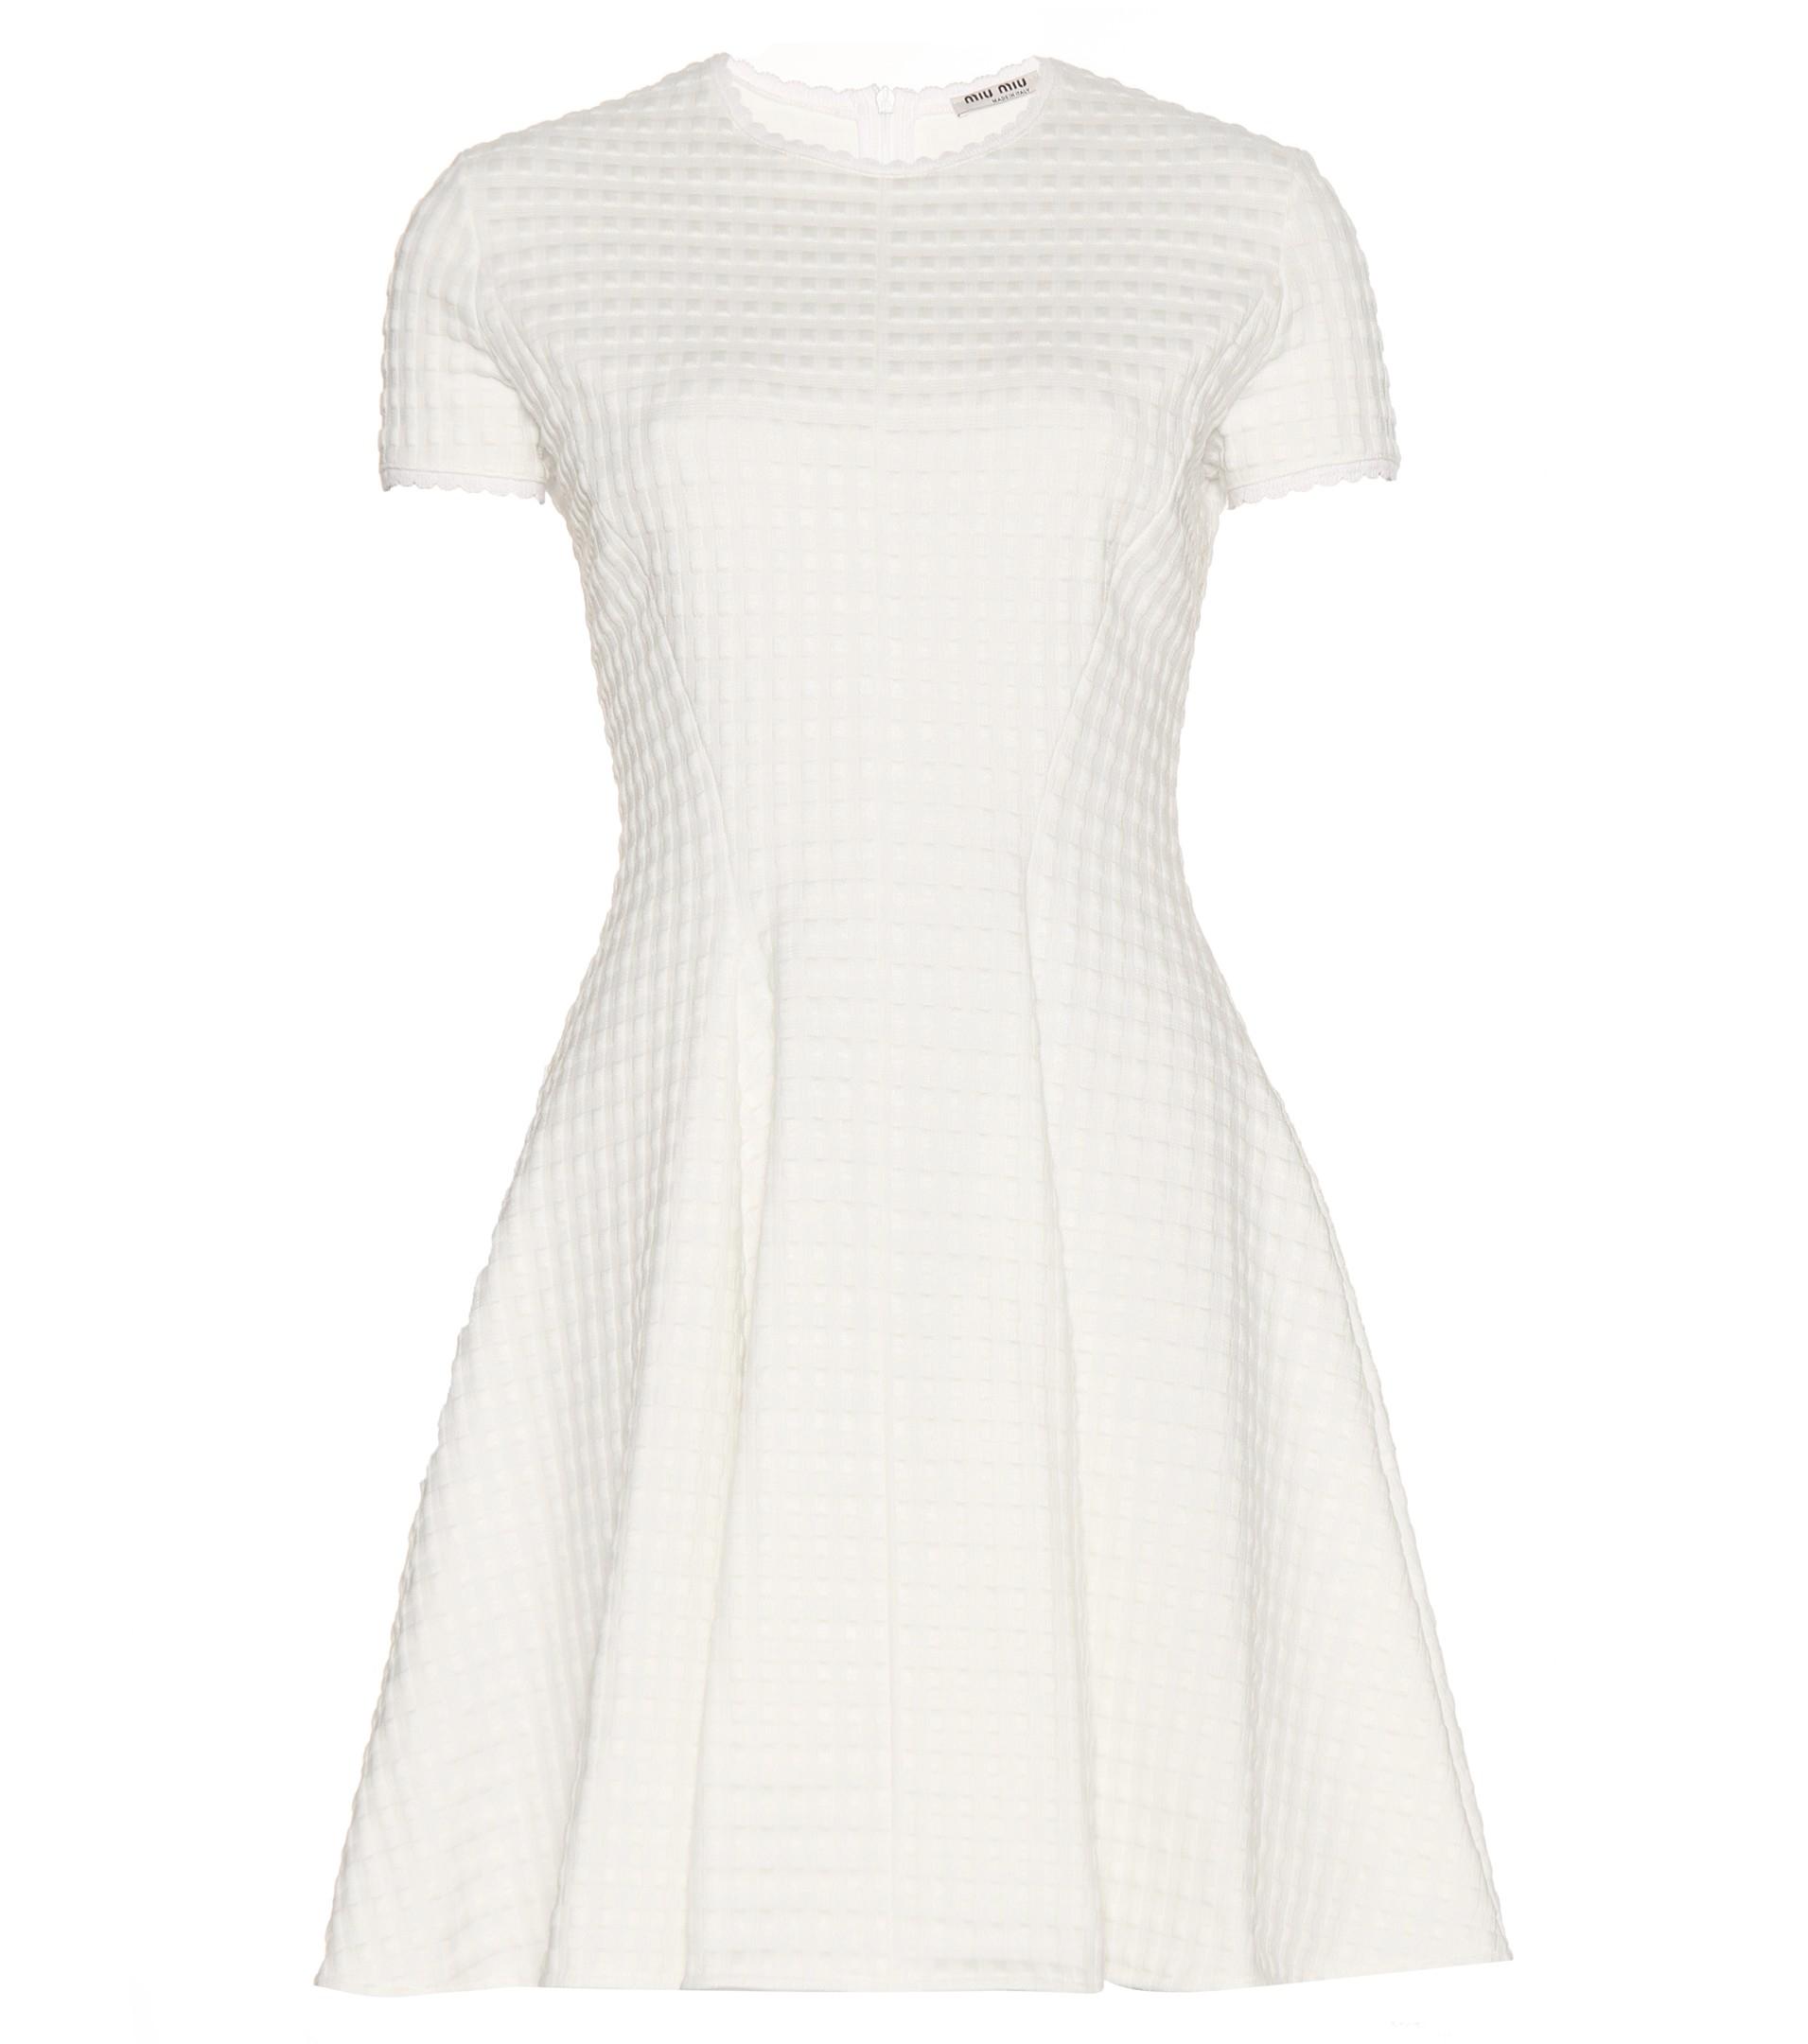 miu miu black and white dress